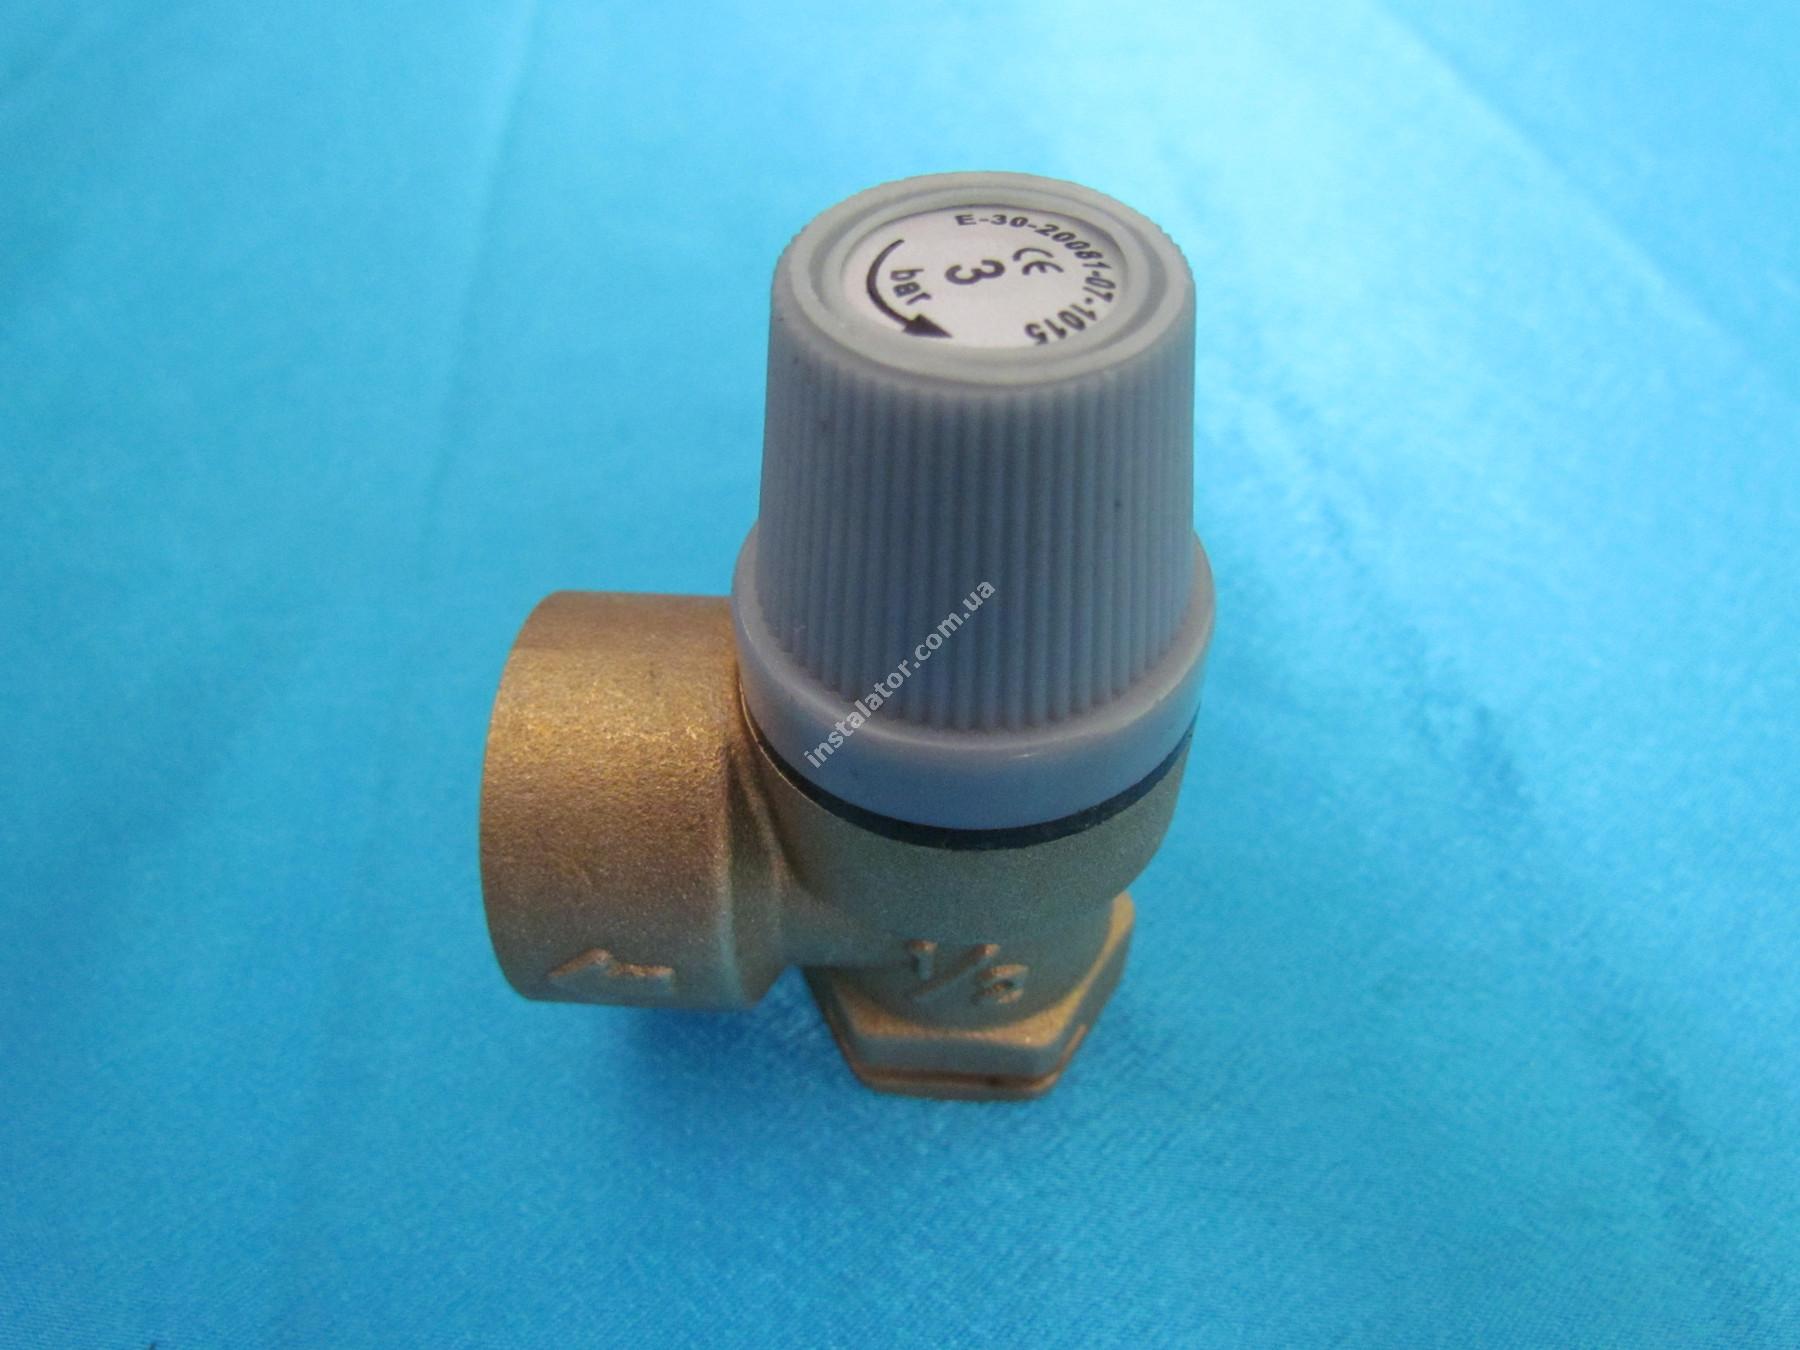 190732 (аналог) Запобіжний клапан  VAILLANT Pro/Plus 3 bar full-image-2